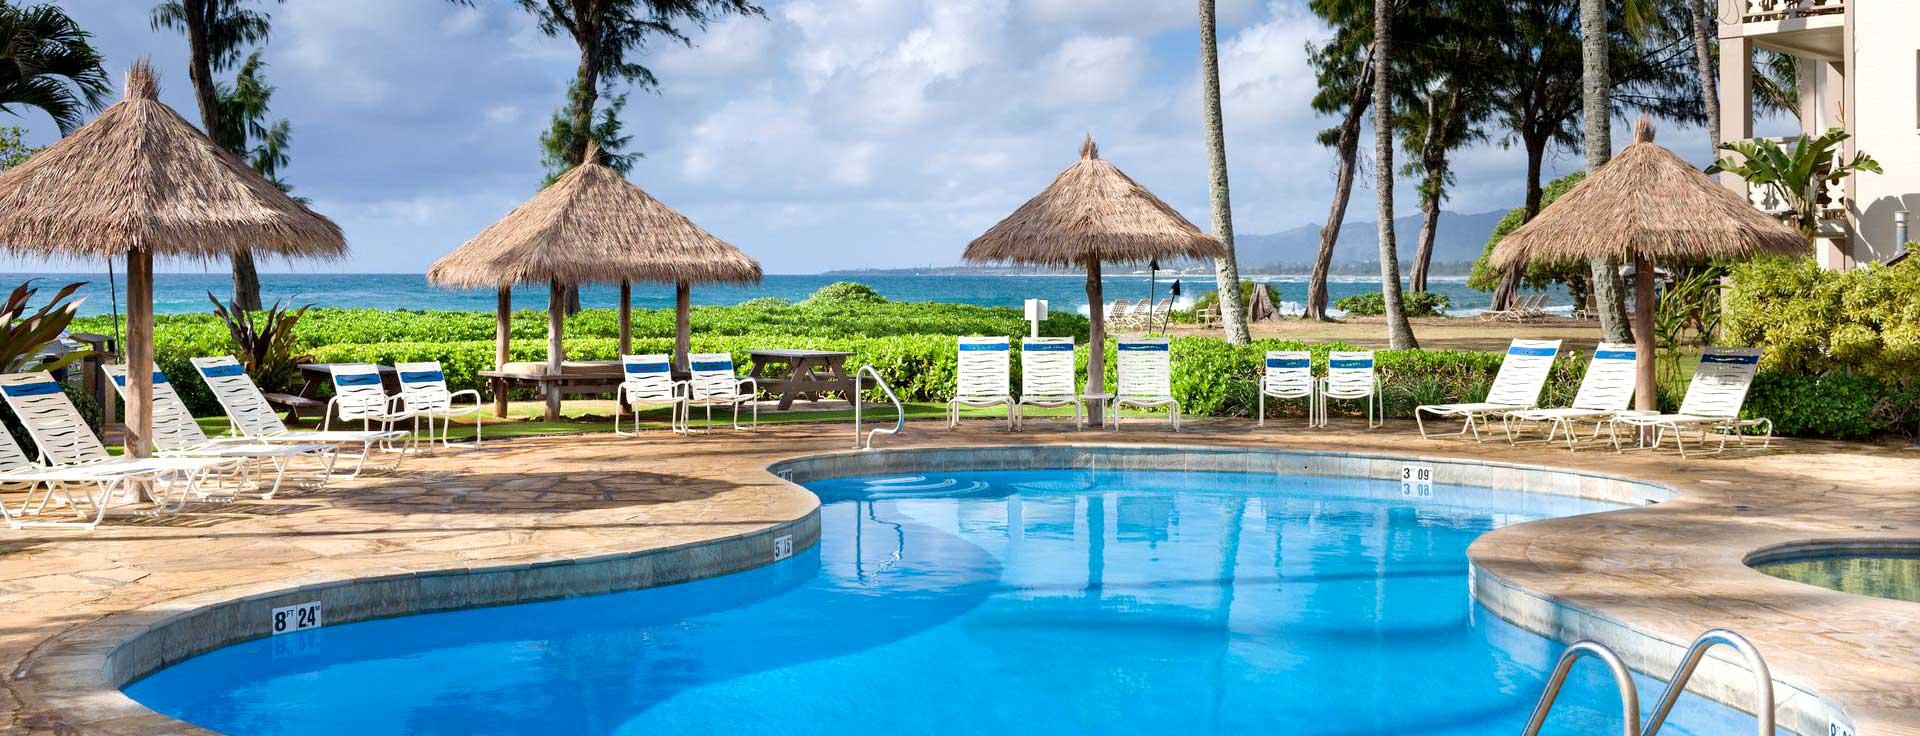 Kauai Islander On The Beach Rental